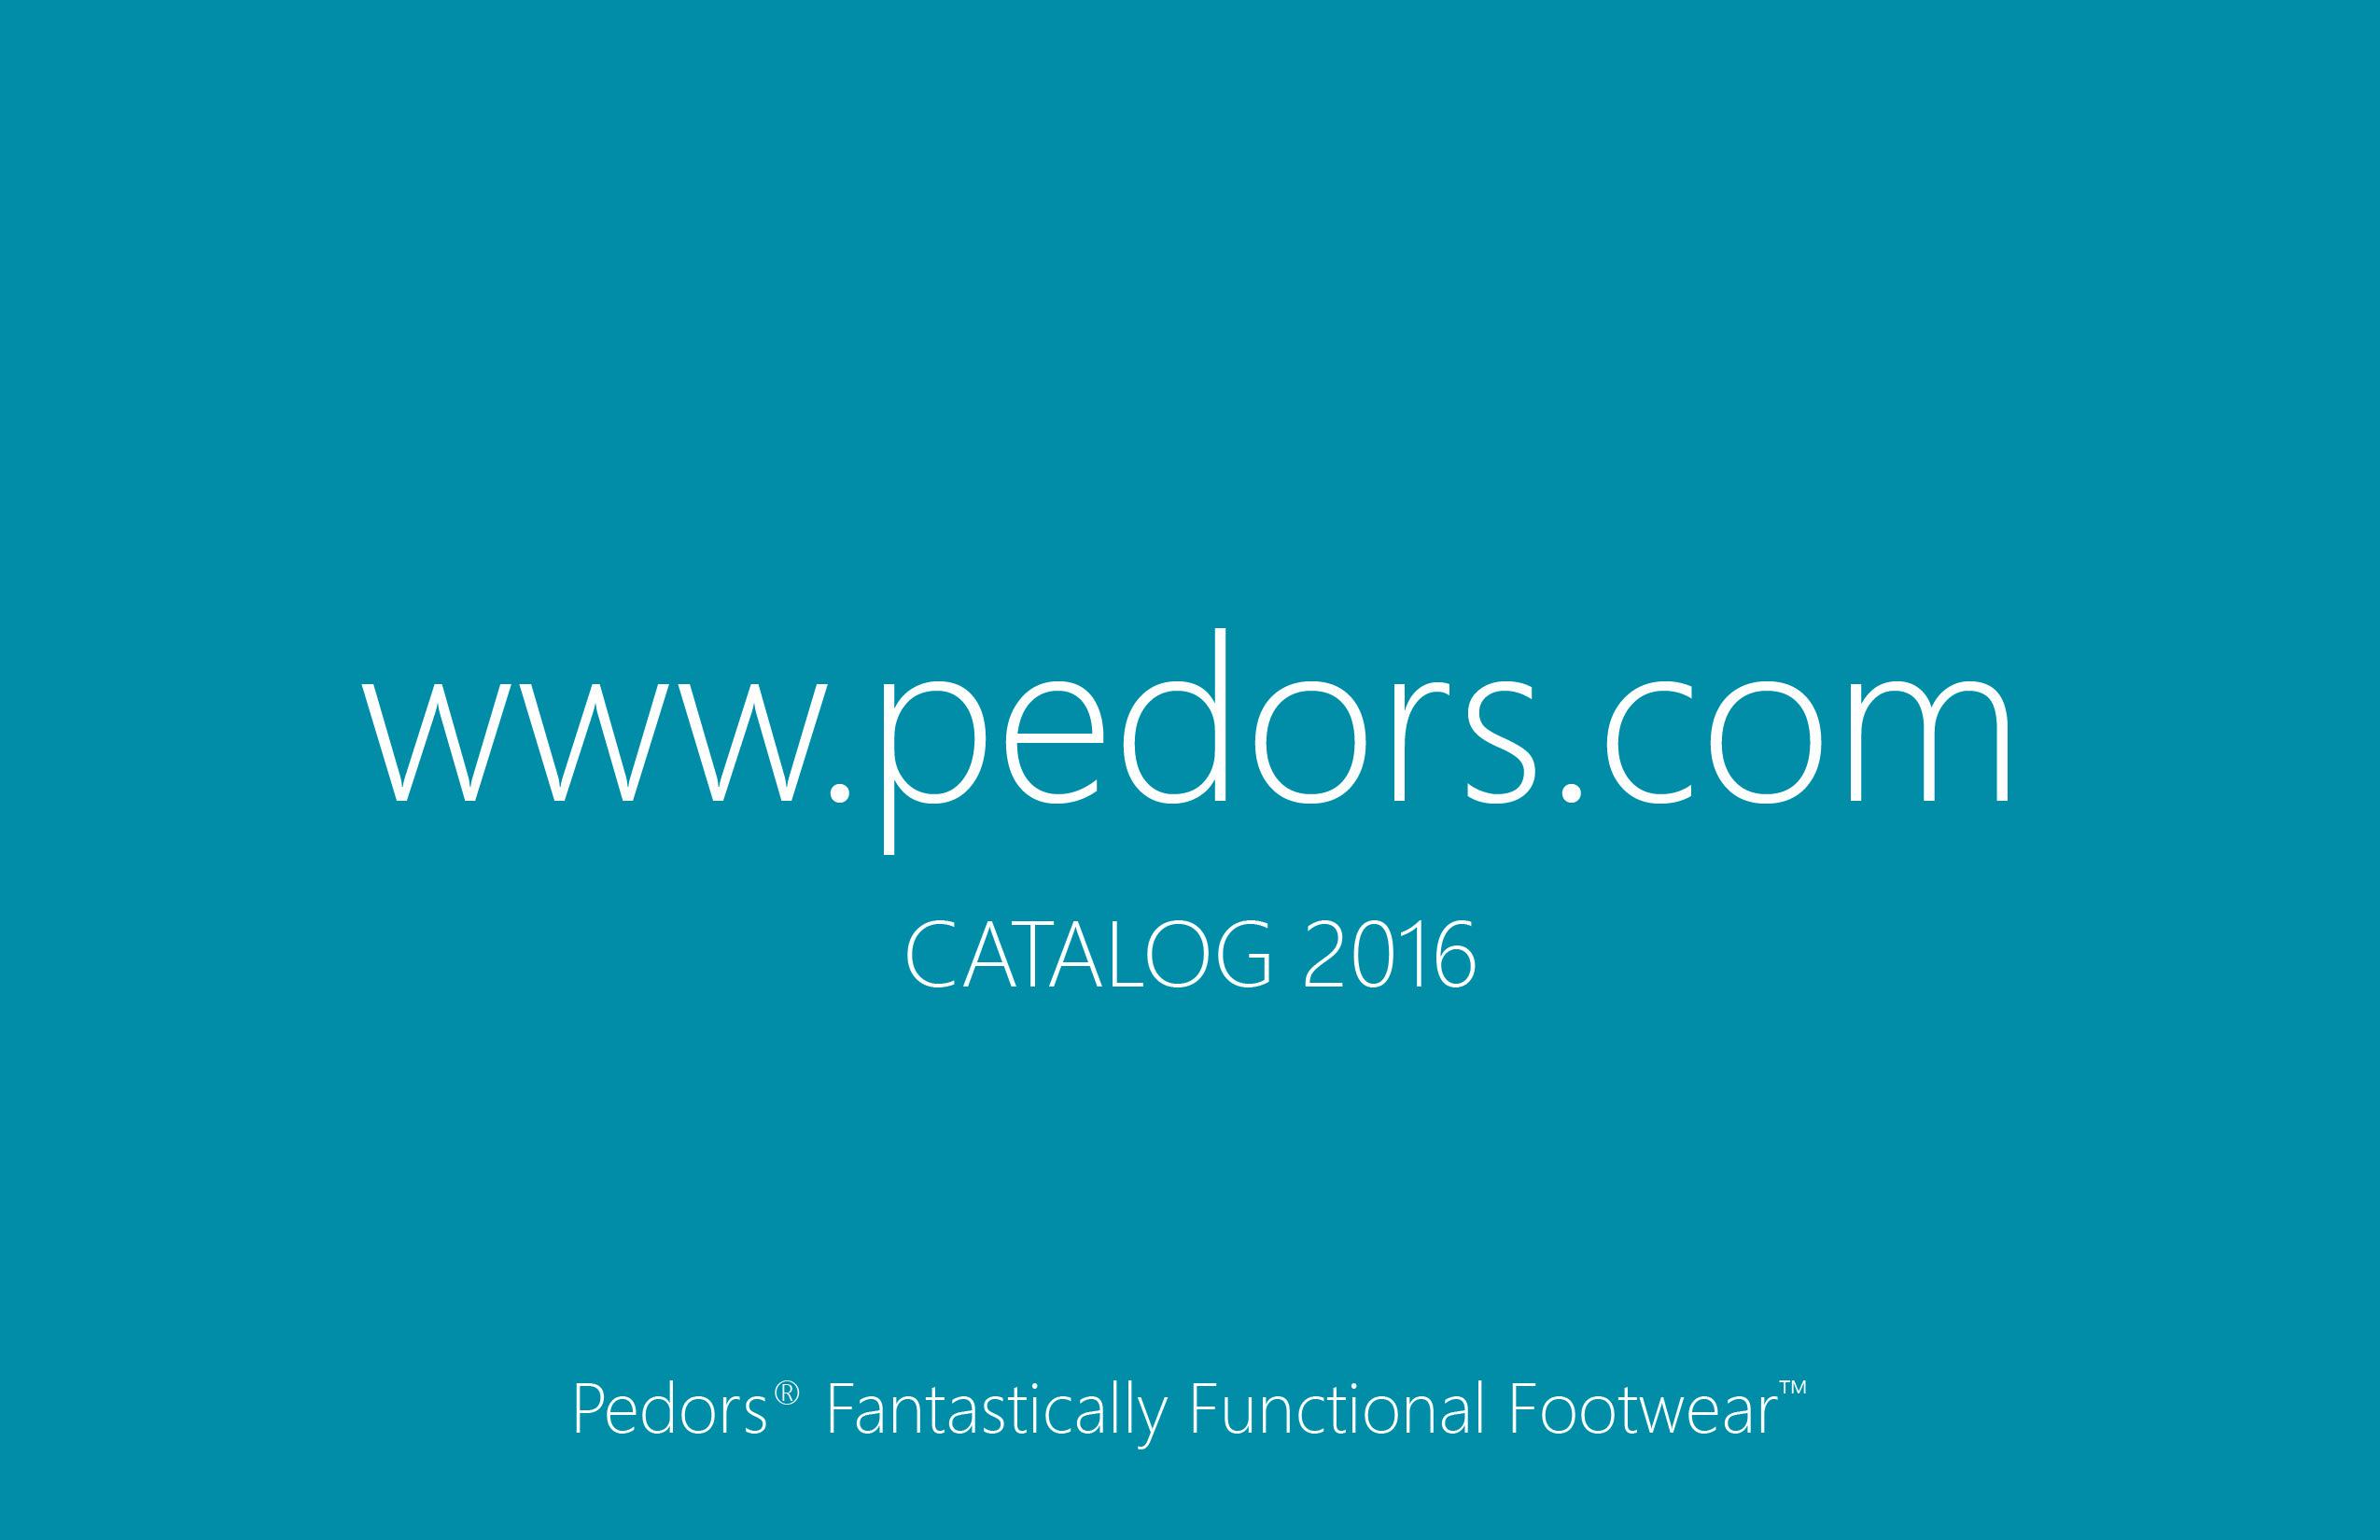 pedors-catalog-2016-front-page-jpeg.jpg